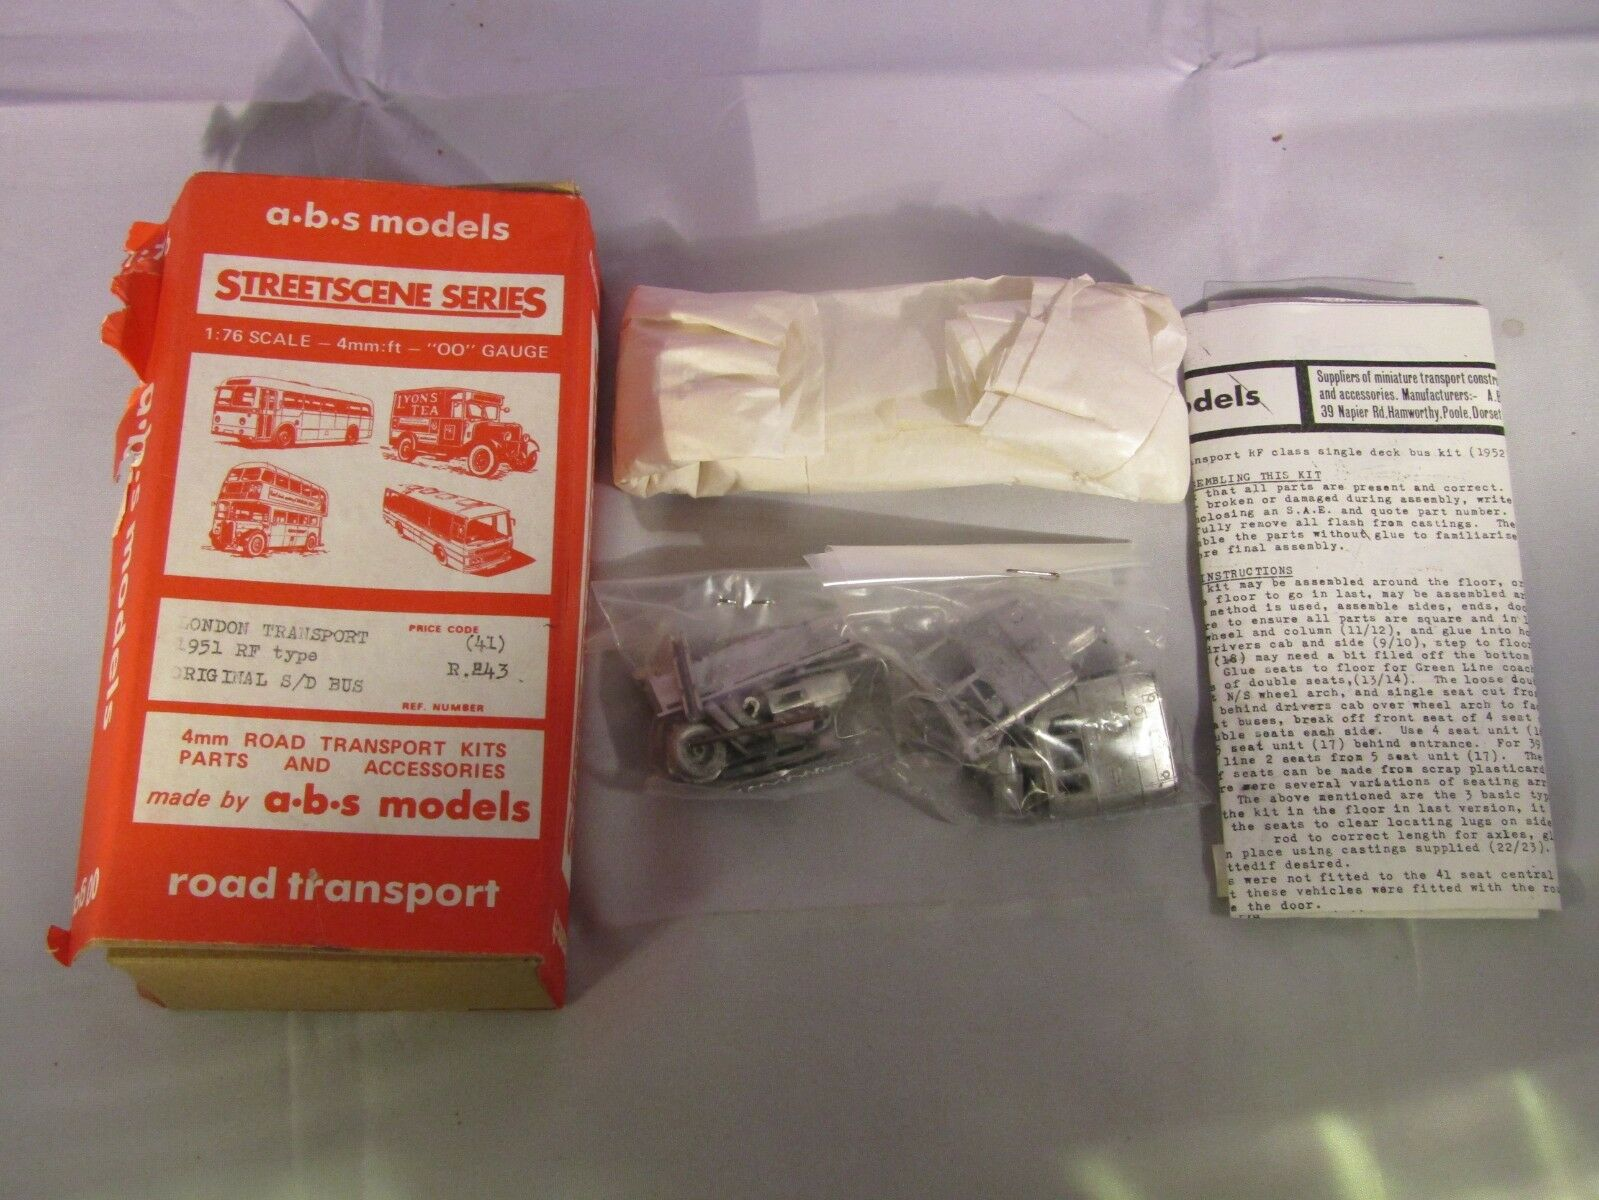 Vintage A.B.S. Models R243 London Transport 1951 RF Type OO Scale UNPAINTED Kit